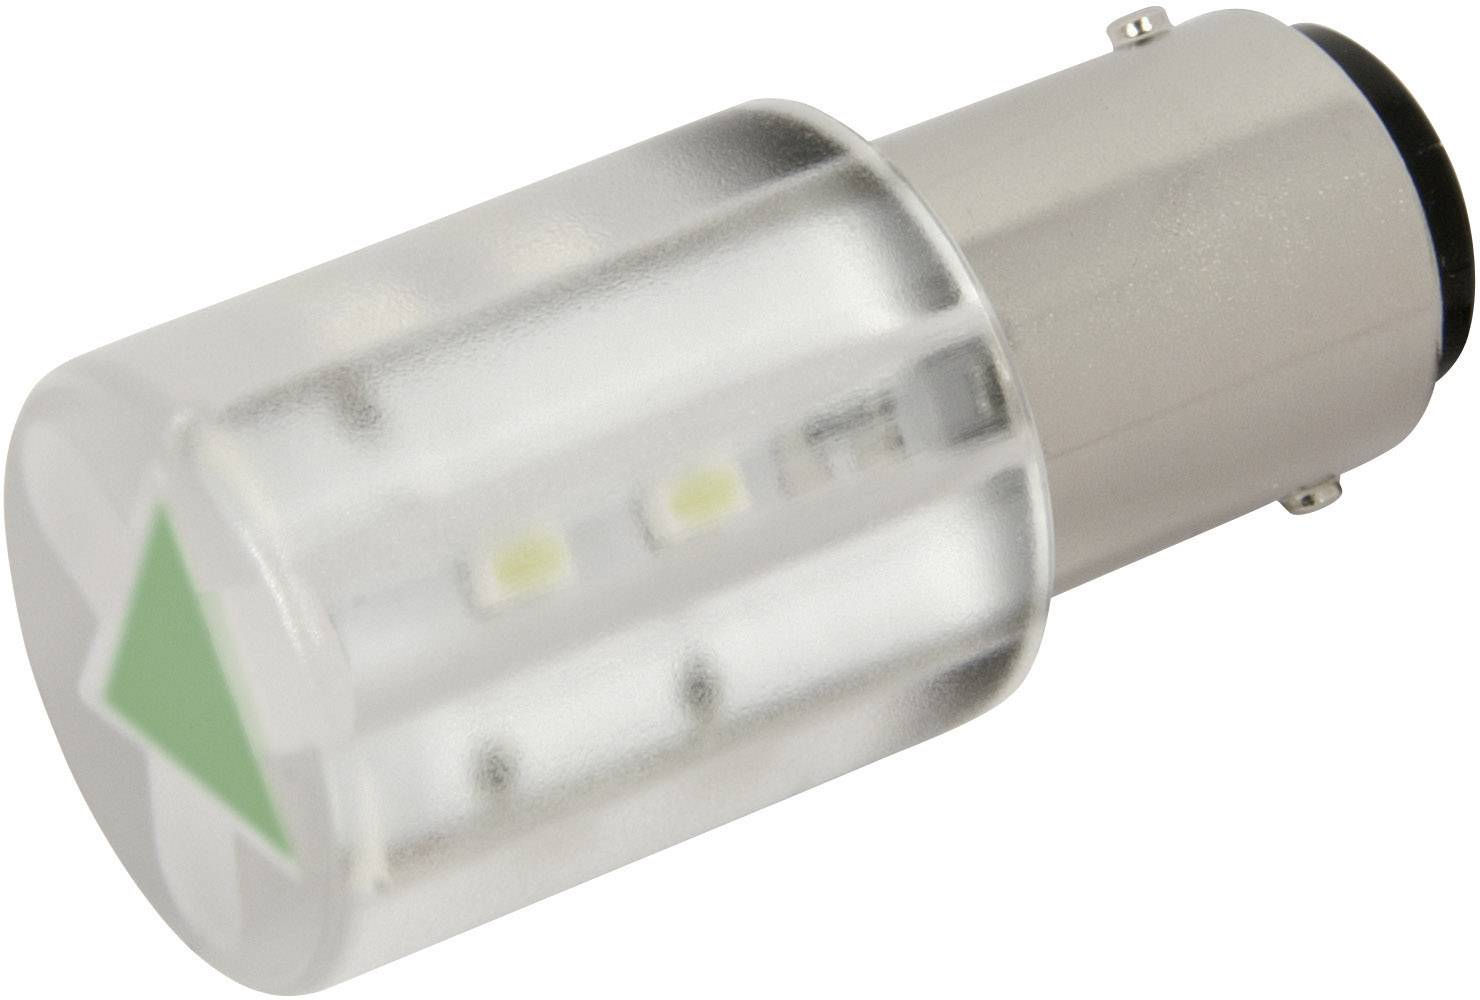 LEDžiarovka CML 18561231, BA15d, 230 V/AC, 280 mcd, zelená